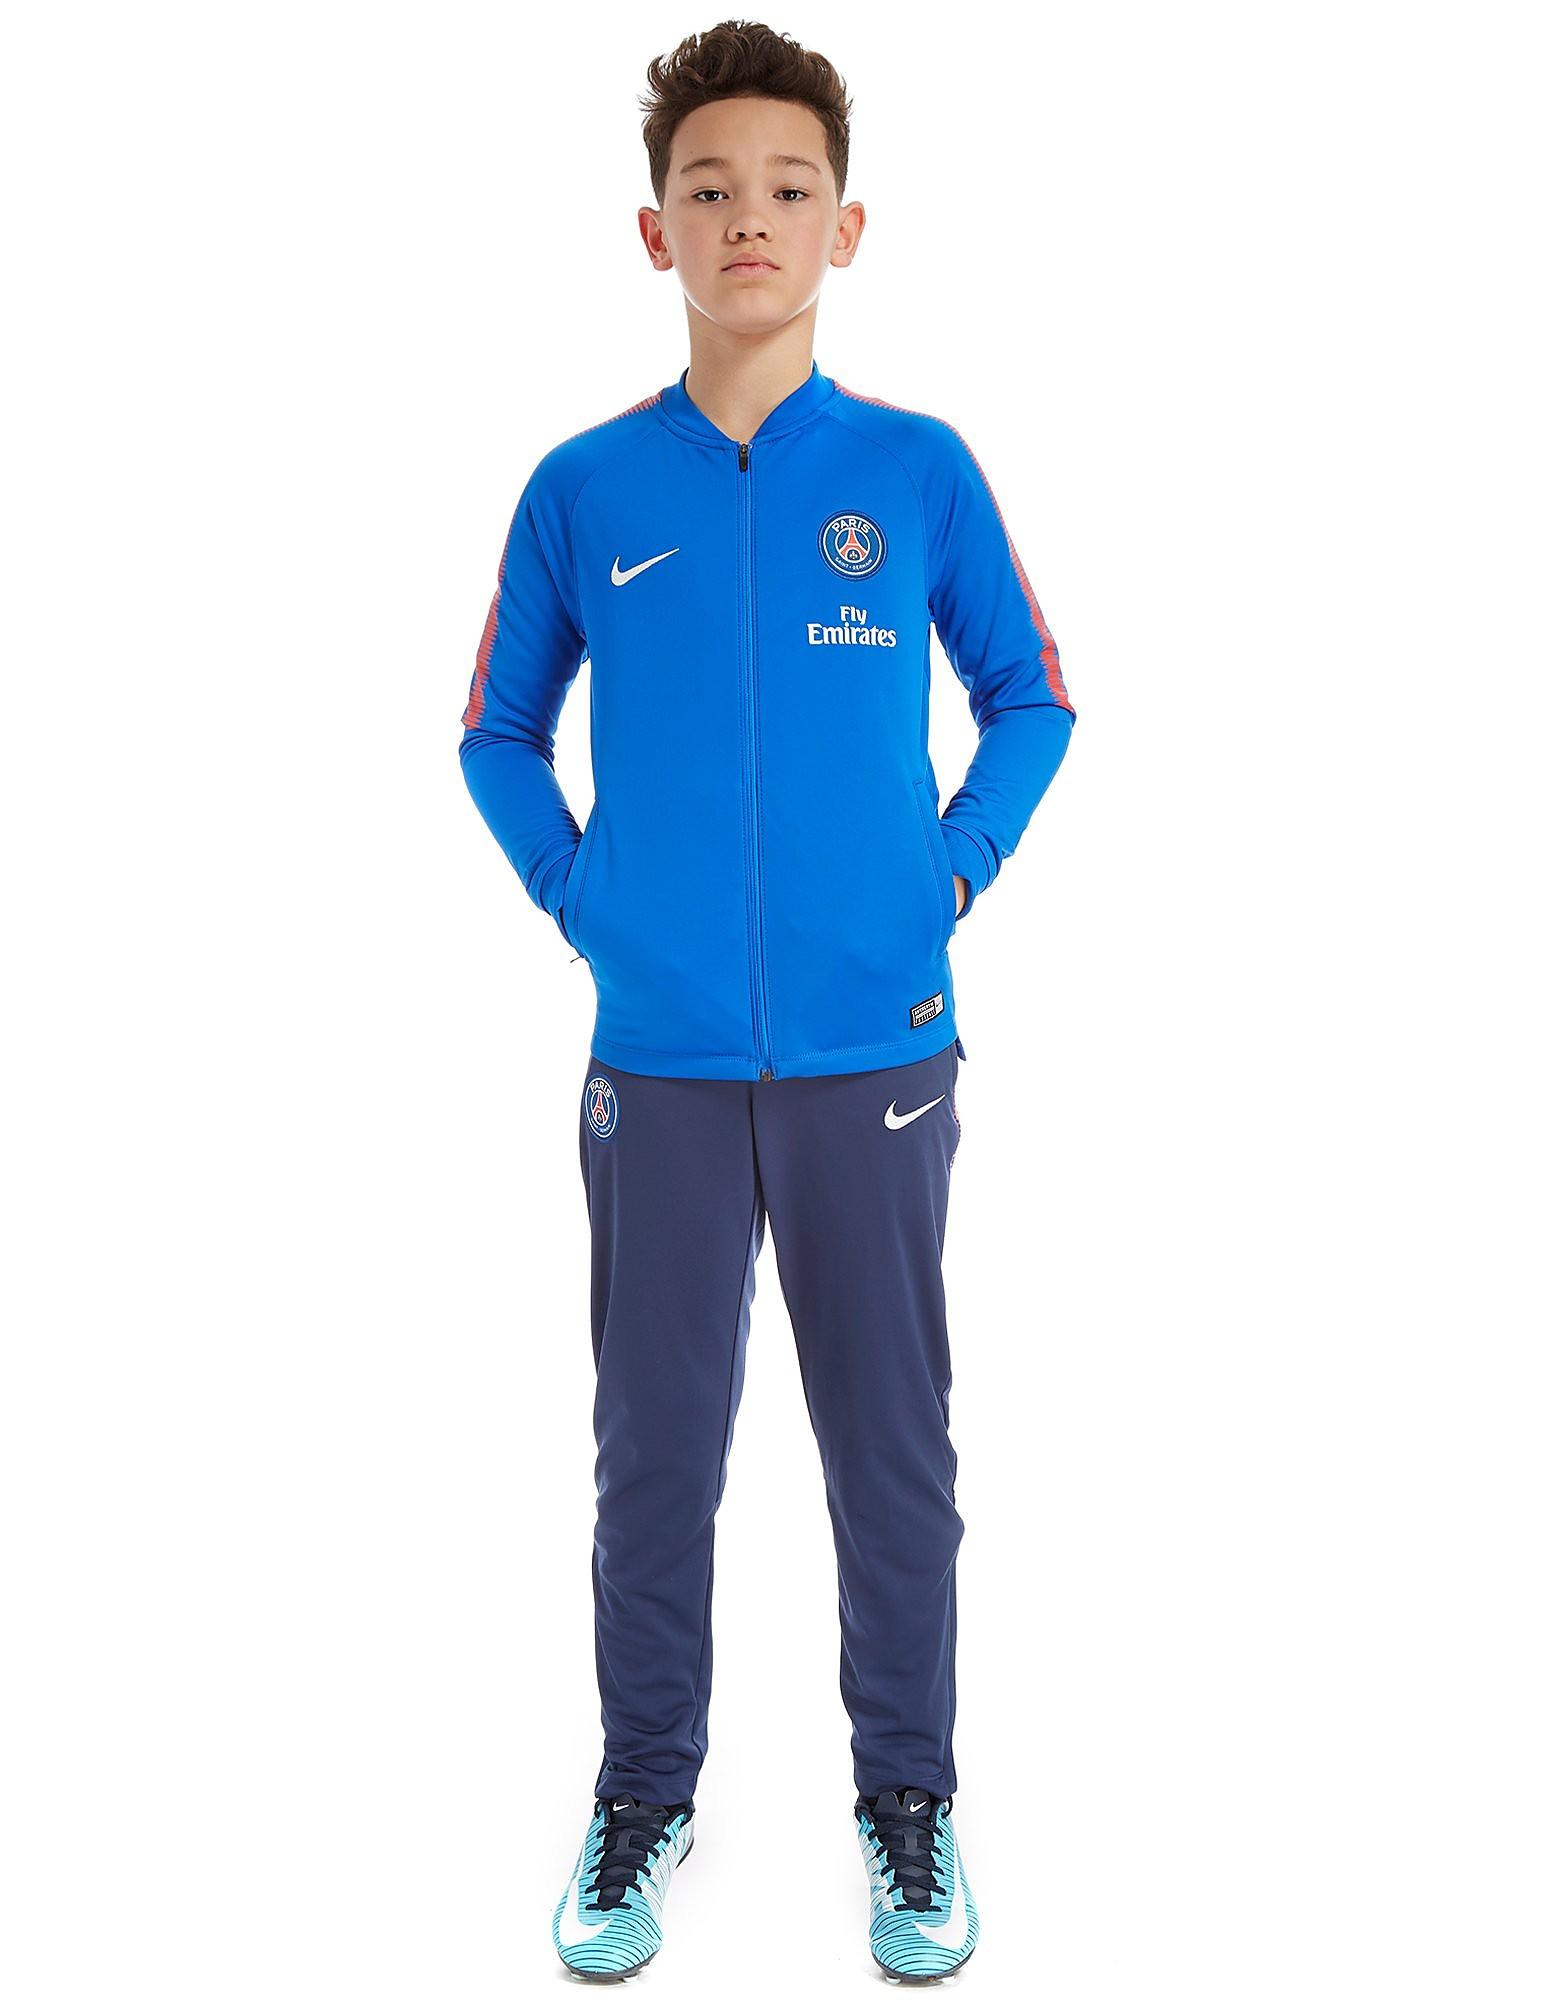 Nike Ensemble Paris Saint Germain Squad Junior